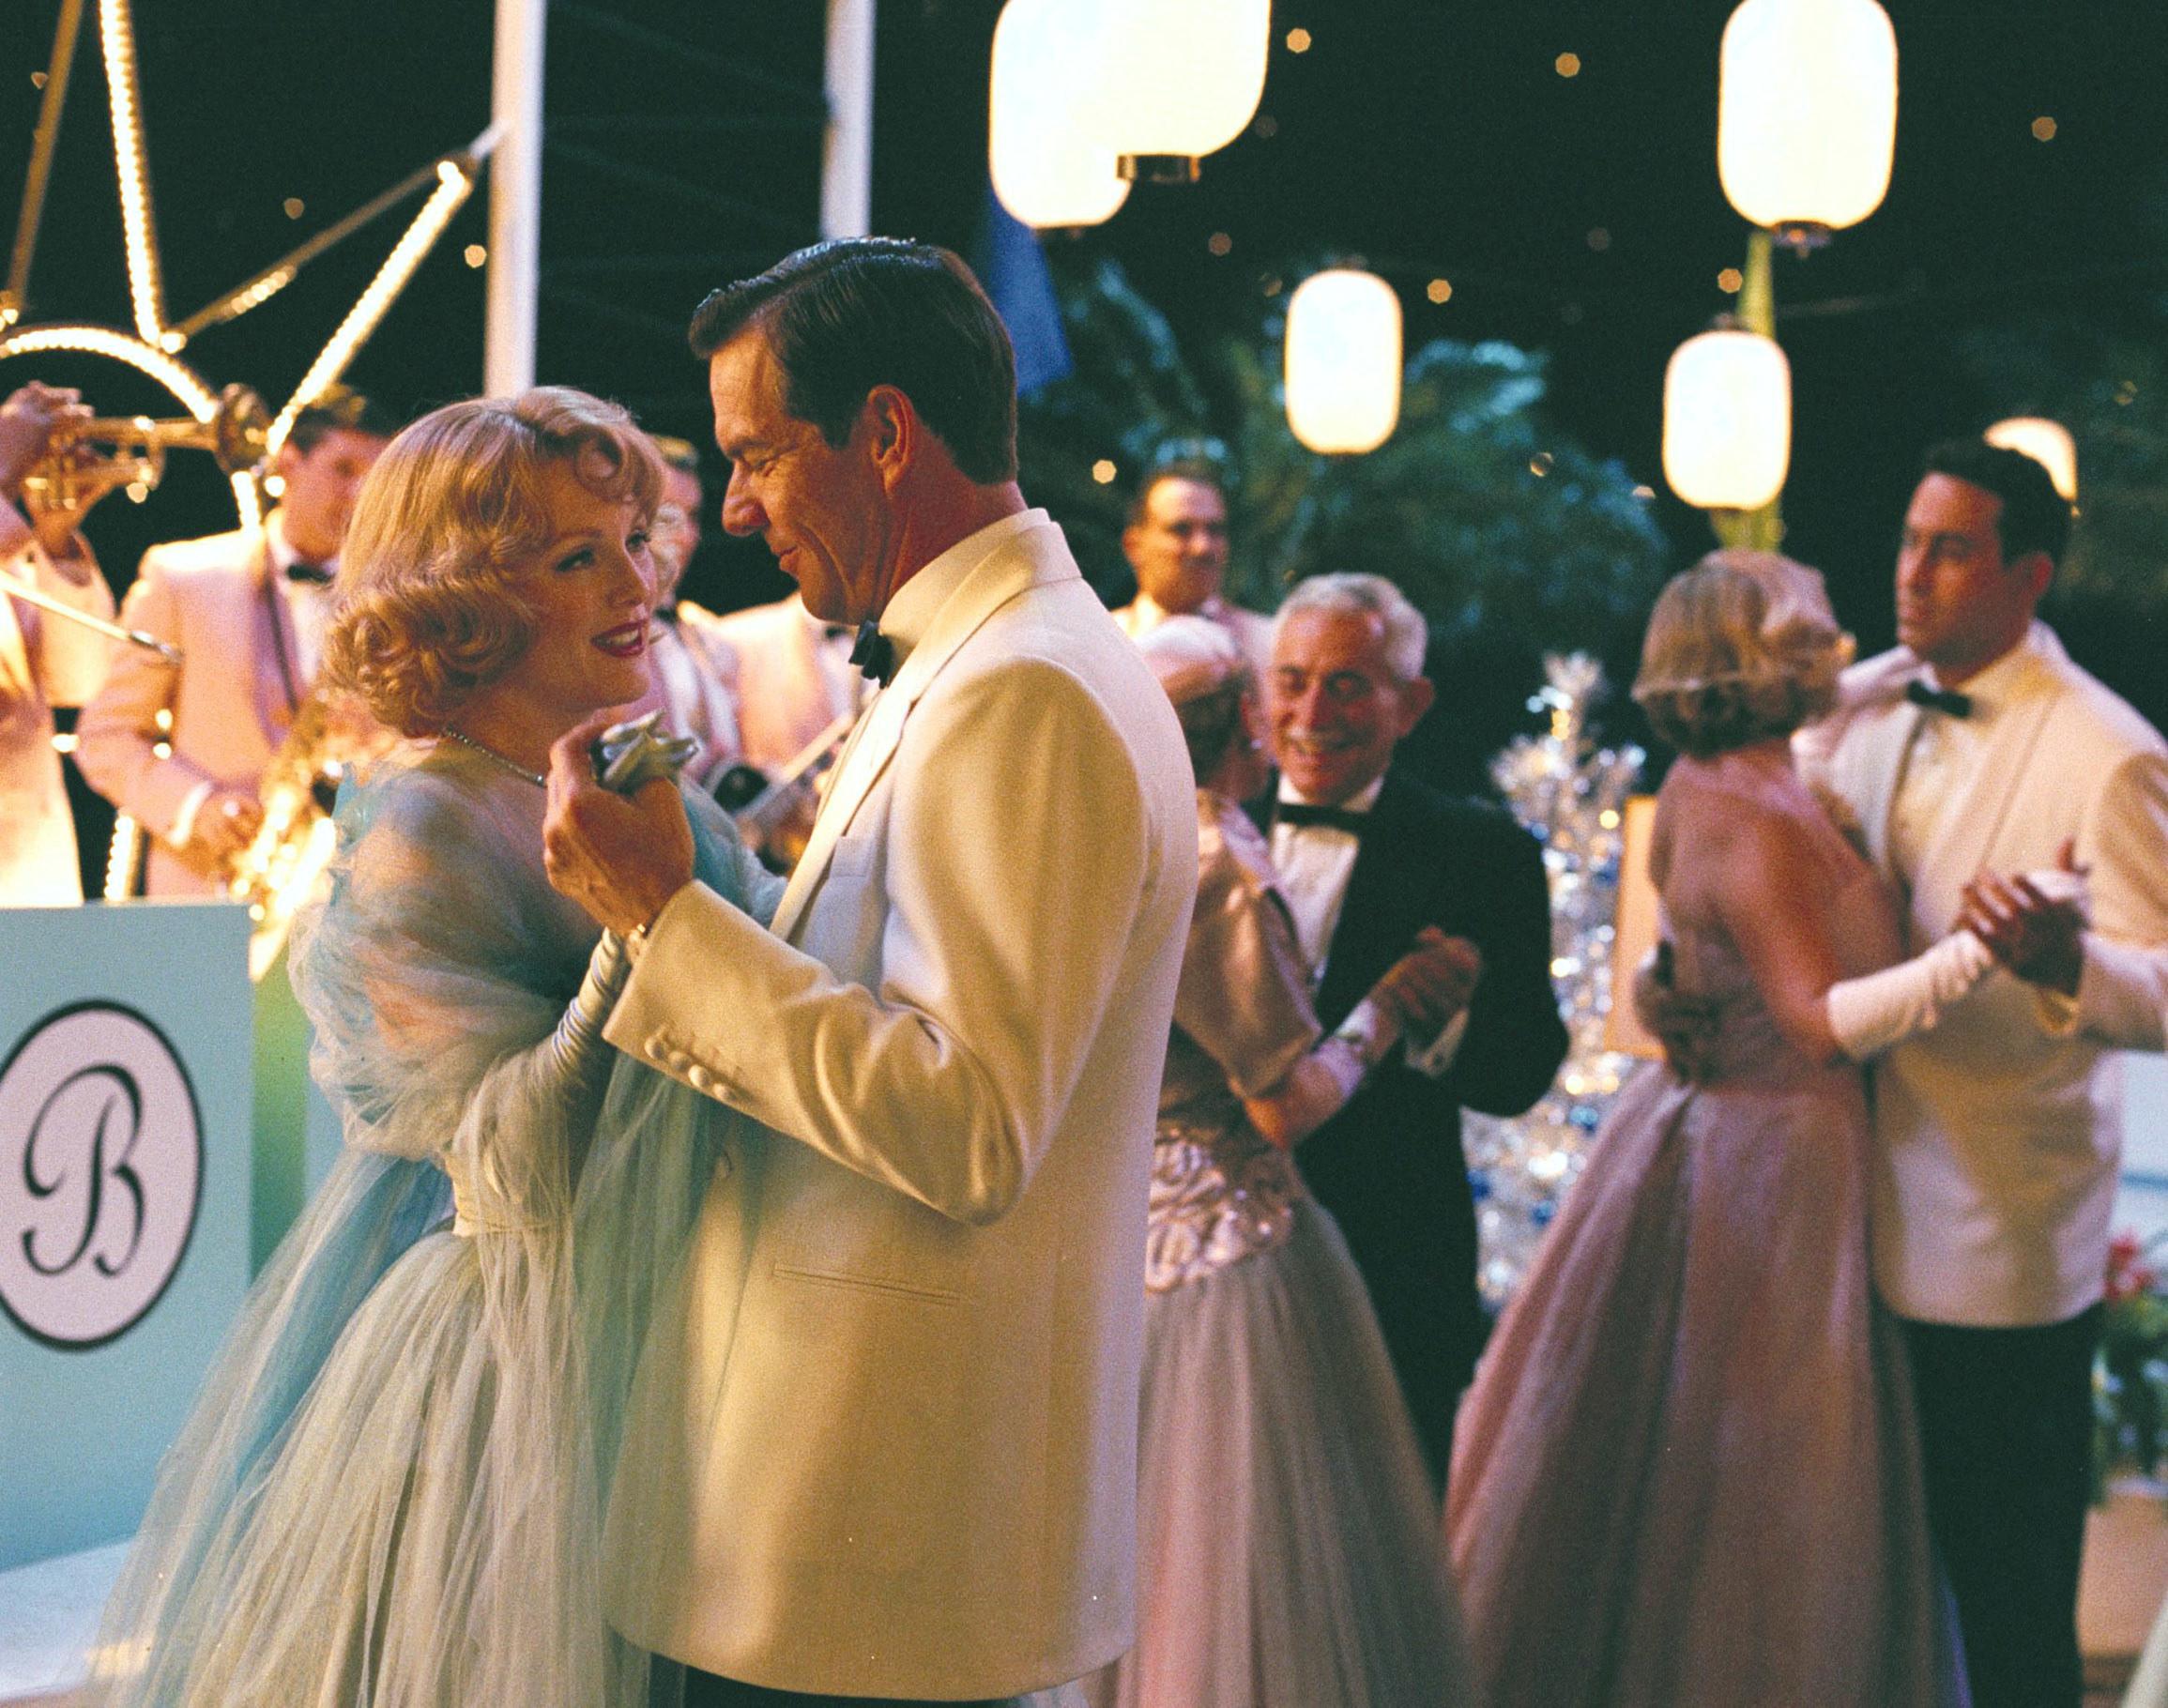 Julianne Moore and Dennis Quaid dancing